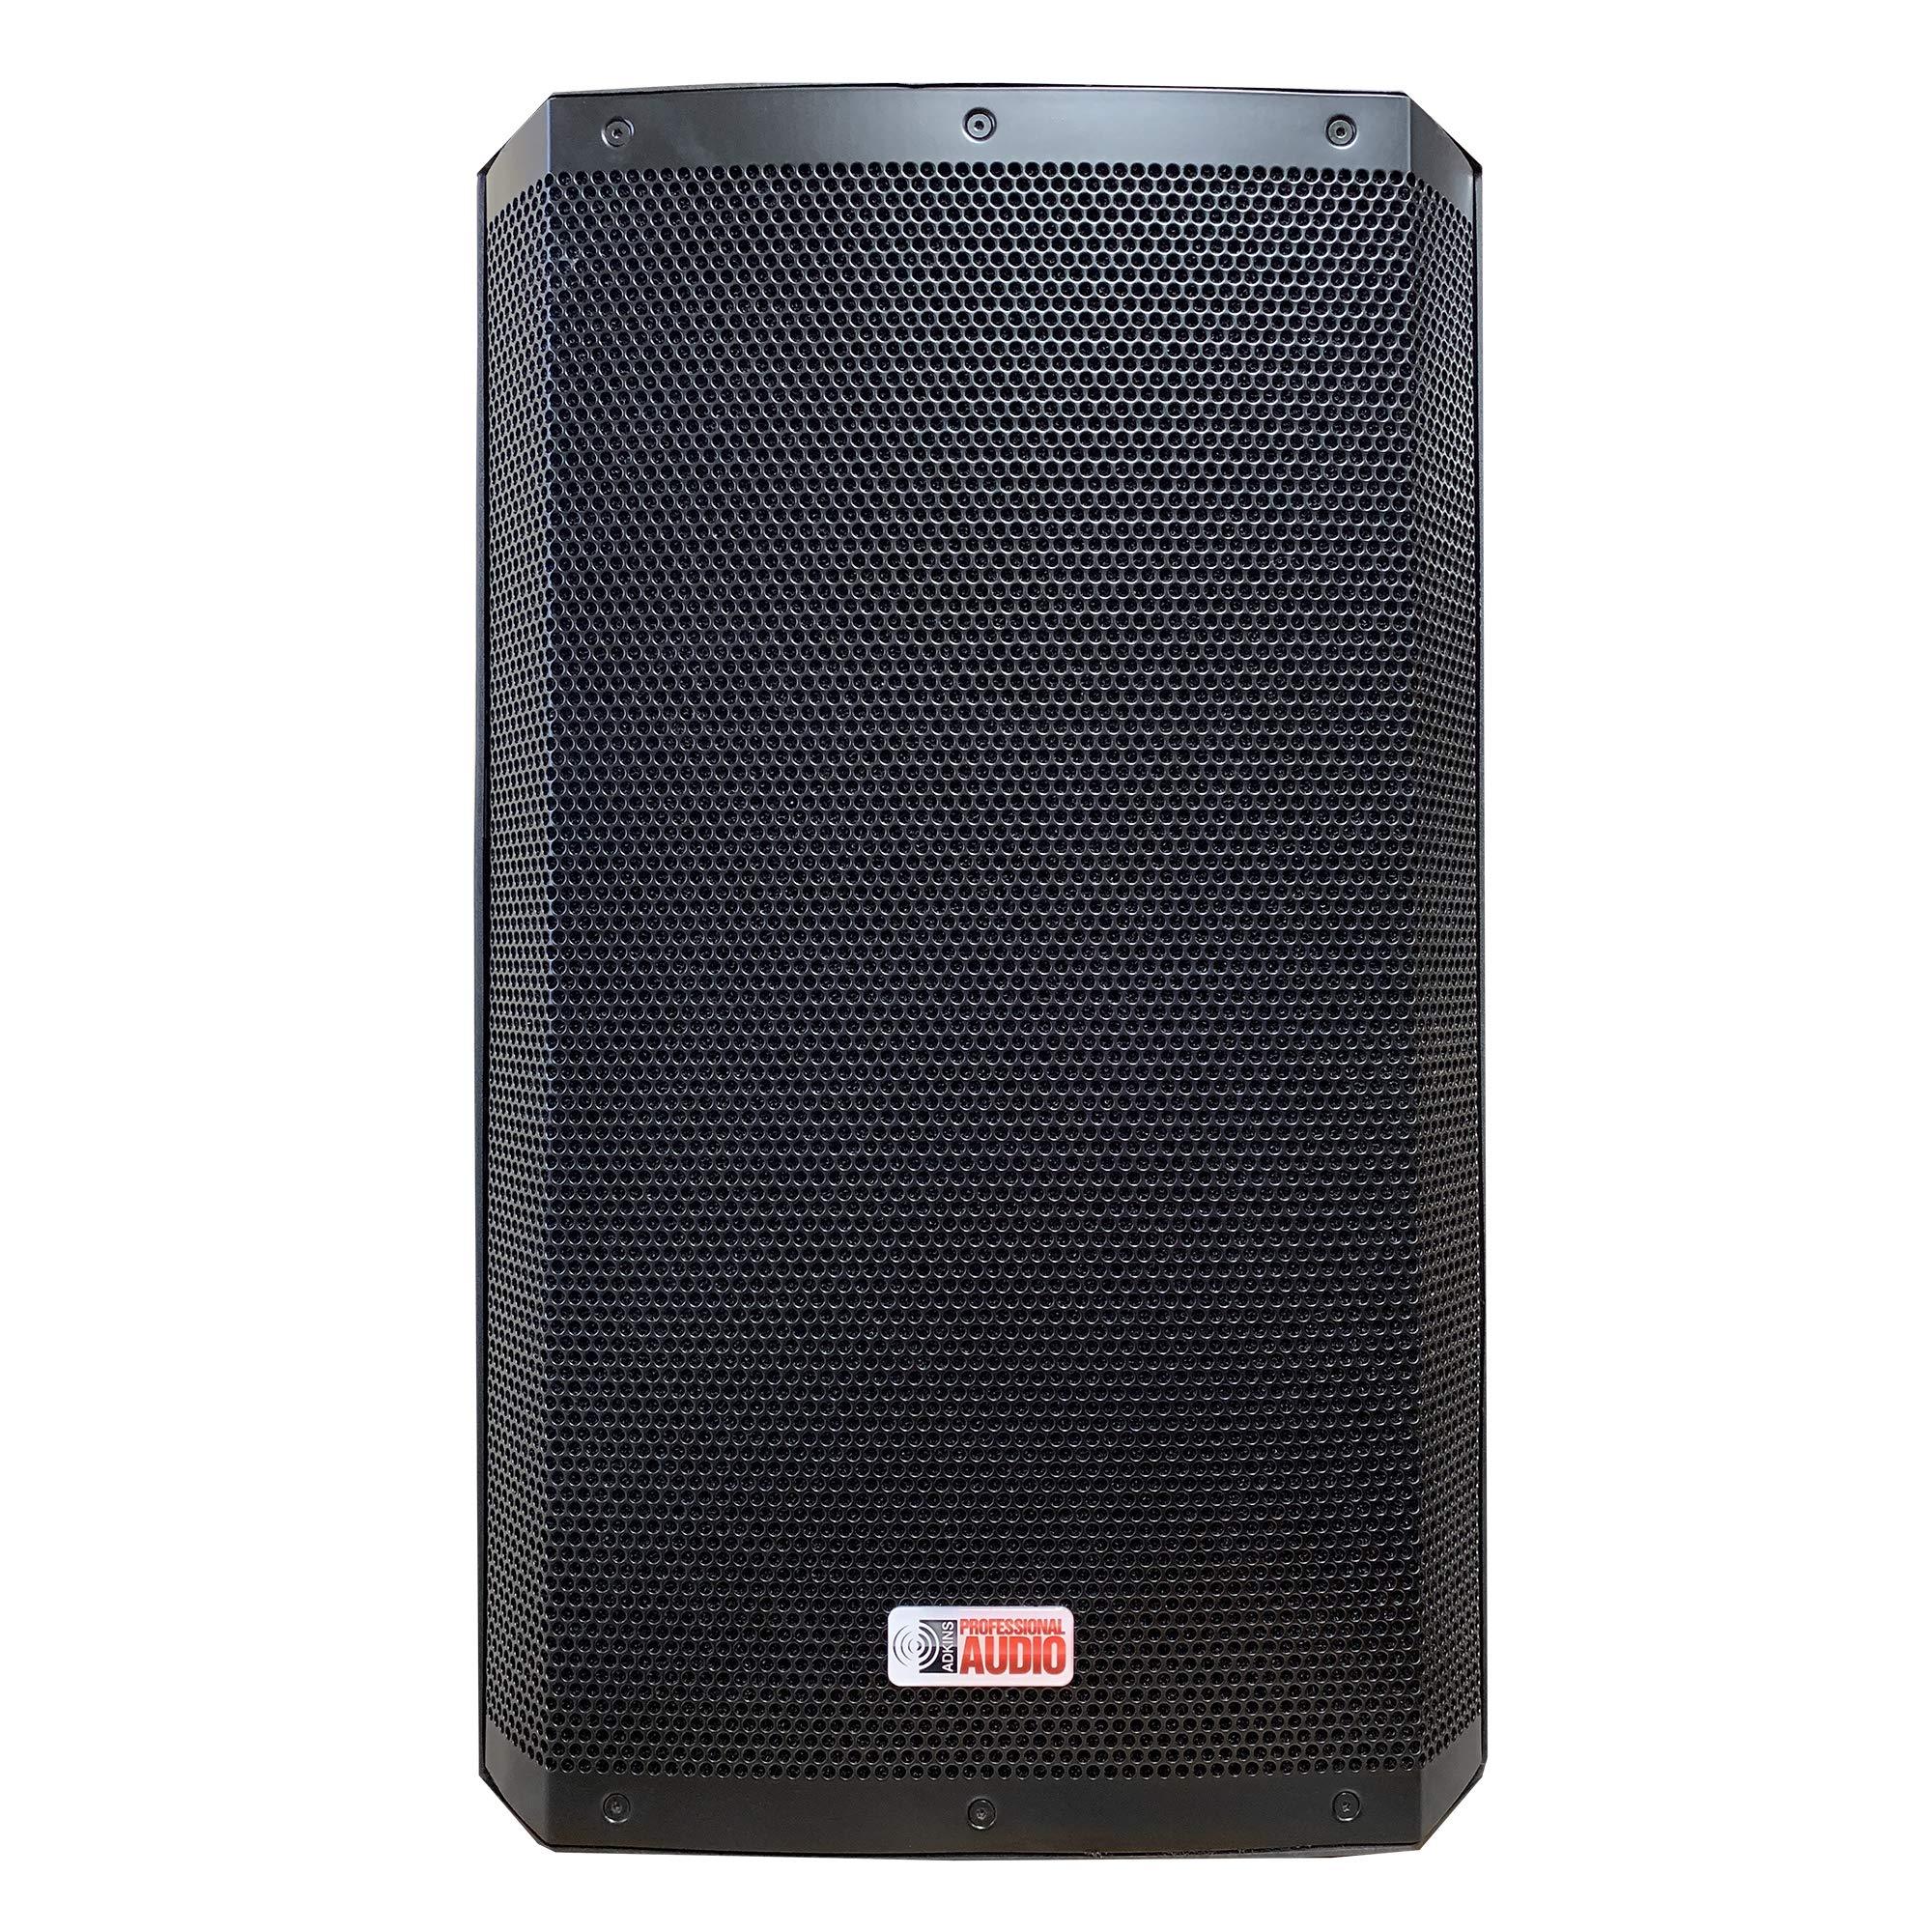 DJ SPEAKER - BLUETOOTH, USB, 15 INCH 2000 WATT BI-AMP 2-WAY POWERED SPEAKER SYSTEM by Adkins Professional Audio